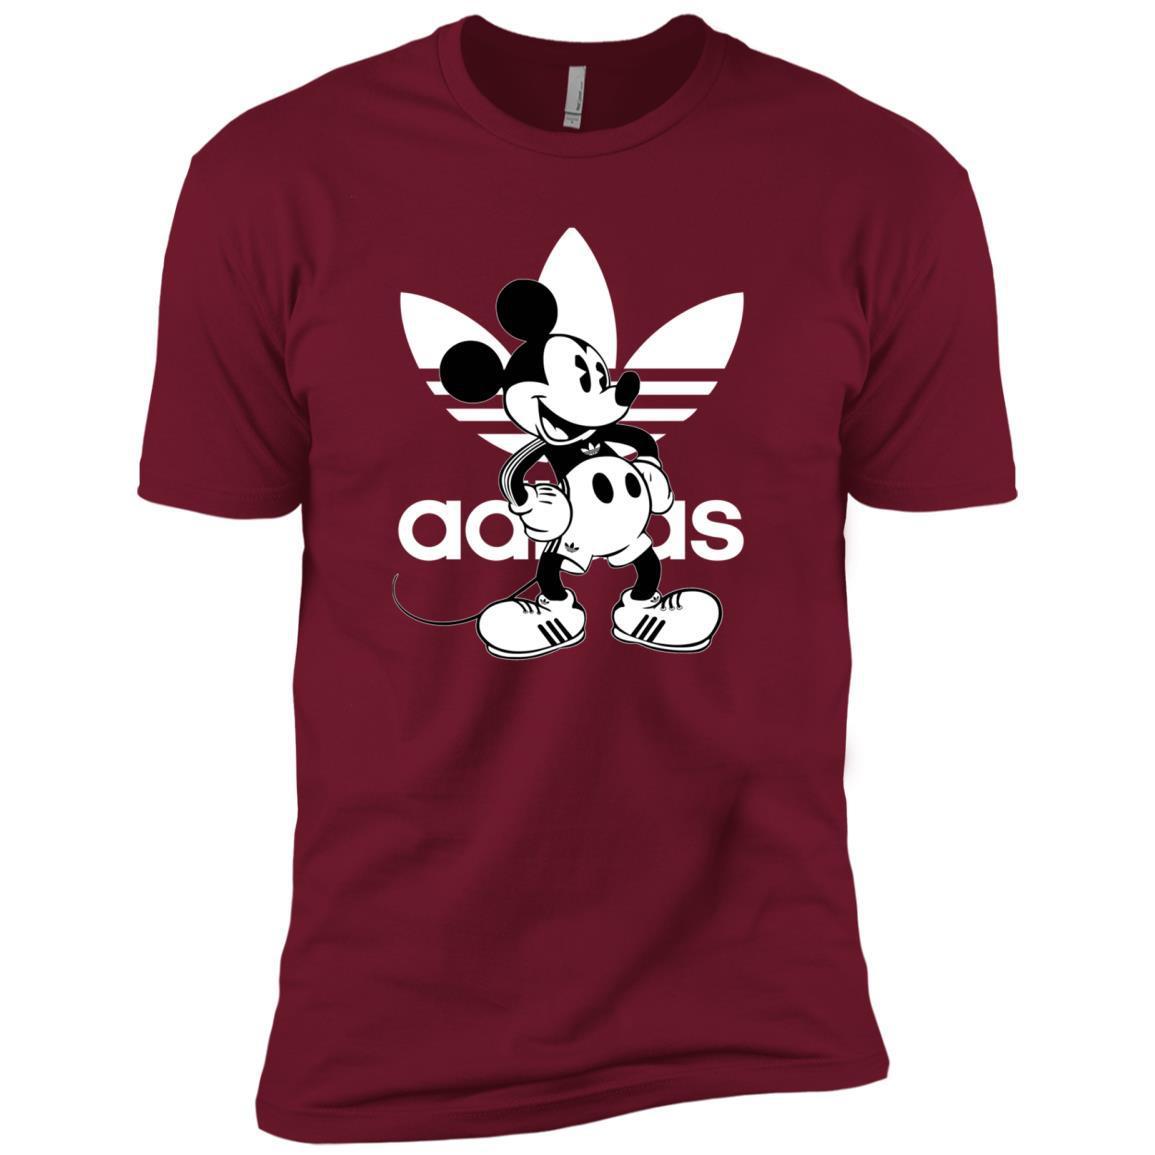 Adidas + Mickey